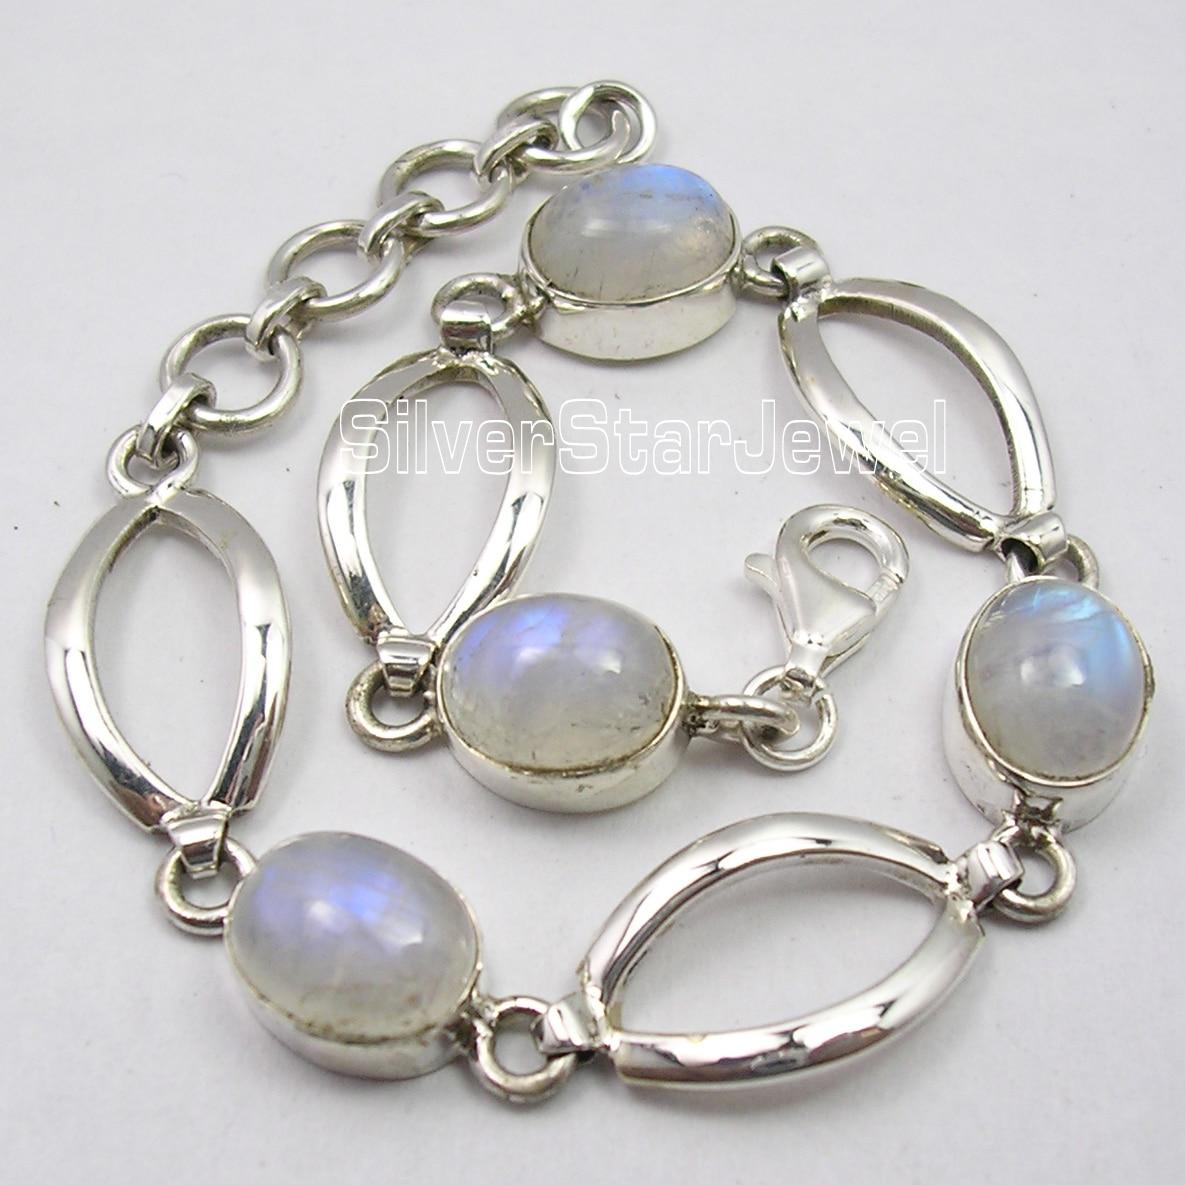 Chanti International Solid Silver Fancy RAINBOW MOONSTONE RETRO STYLE Beautiful Bracelet 7 5/8